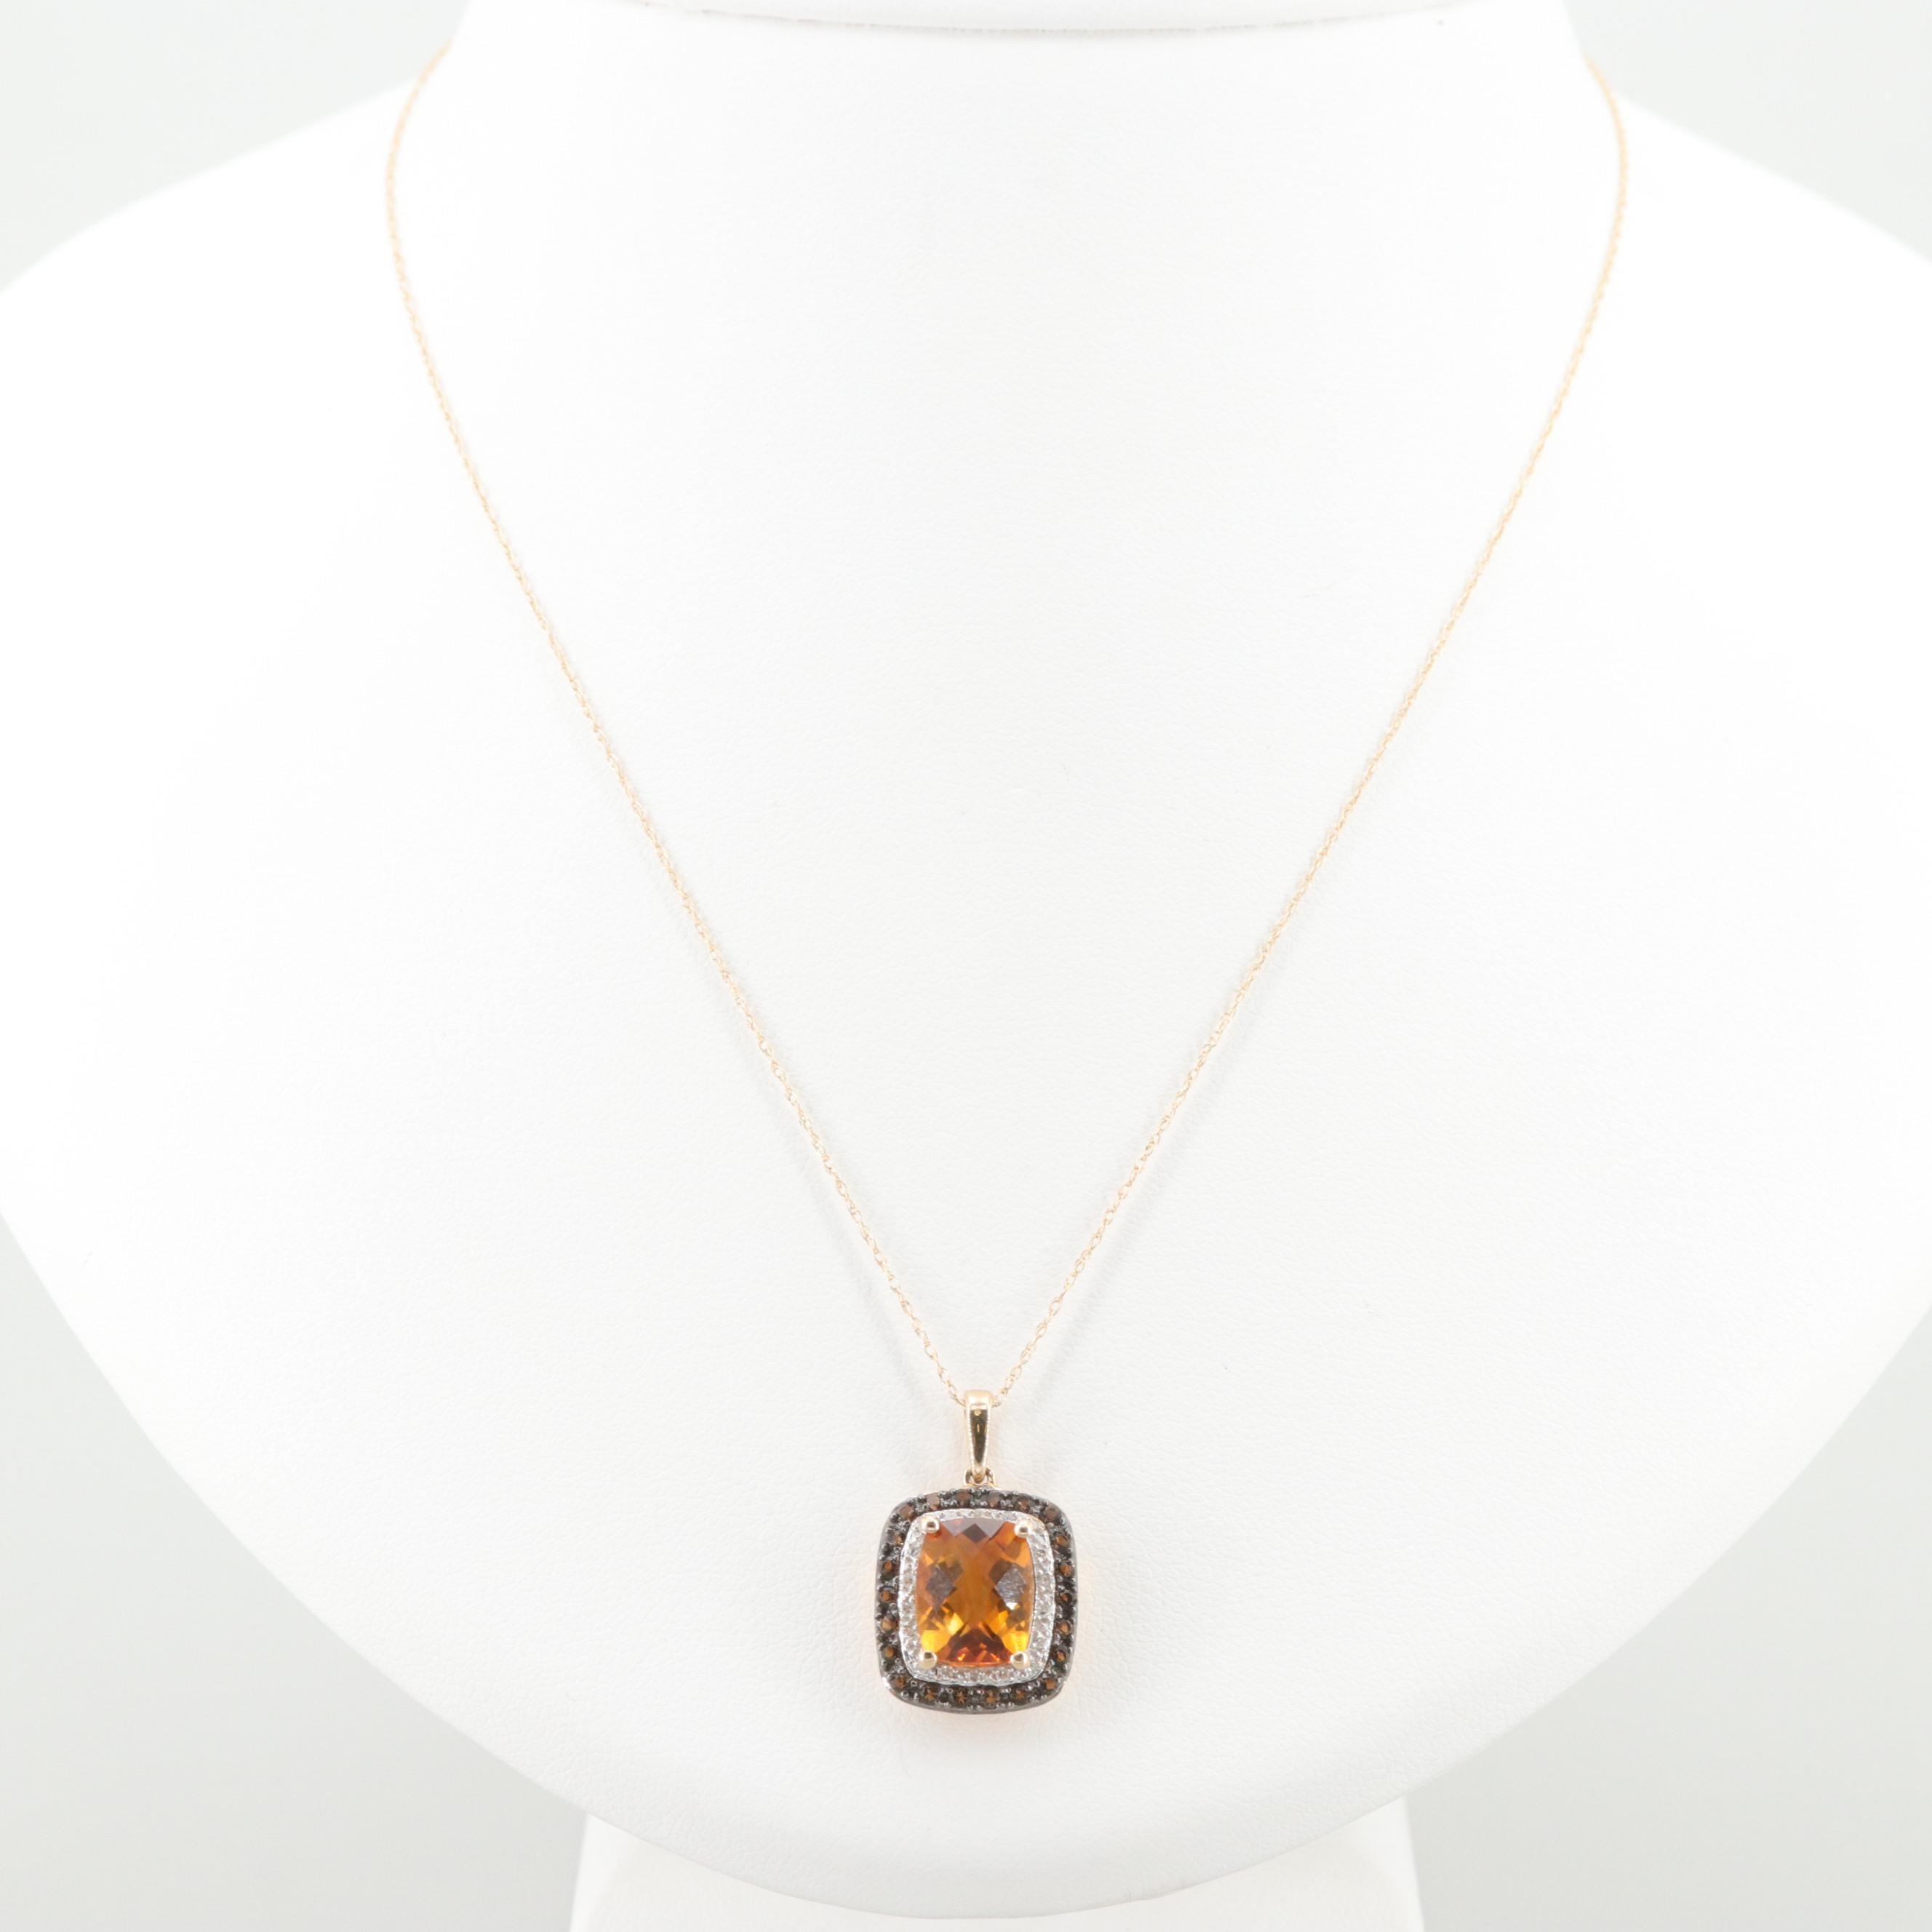 10K Yellow Gold Citrine, Diamond and Smoky Quartz Pendant Necklace